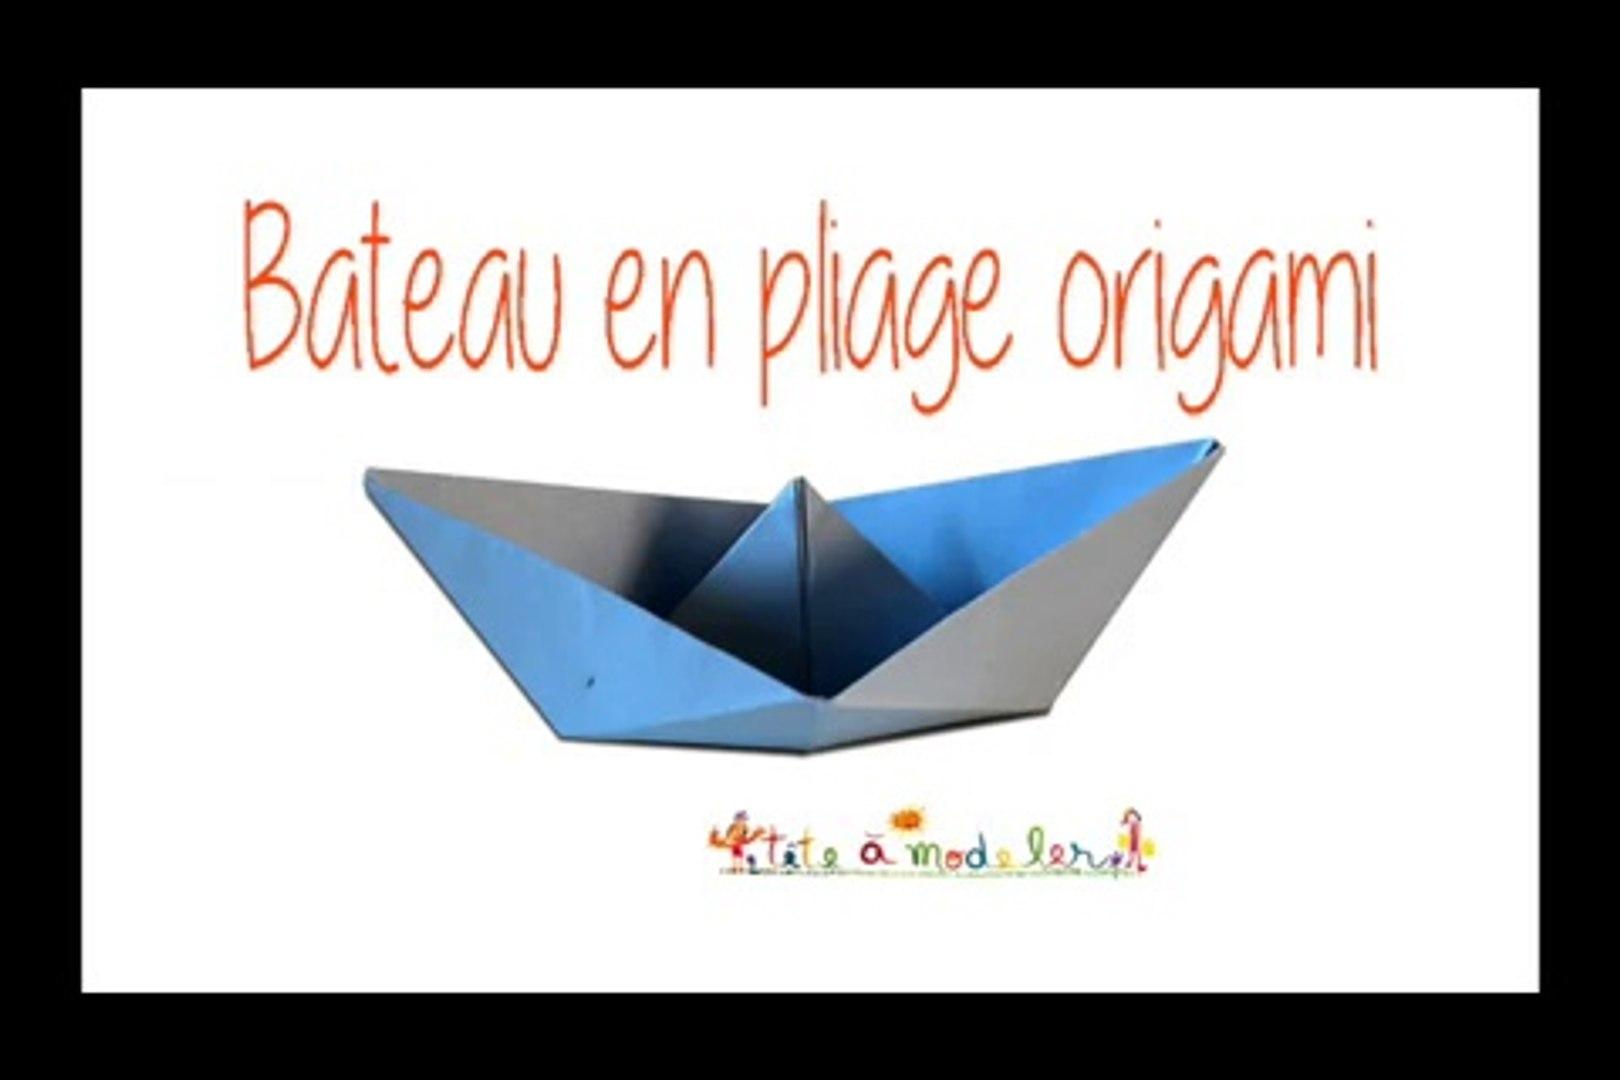 Bateau Origami Video Dailymotion